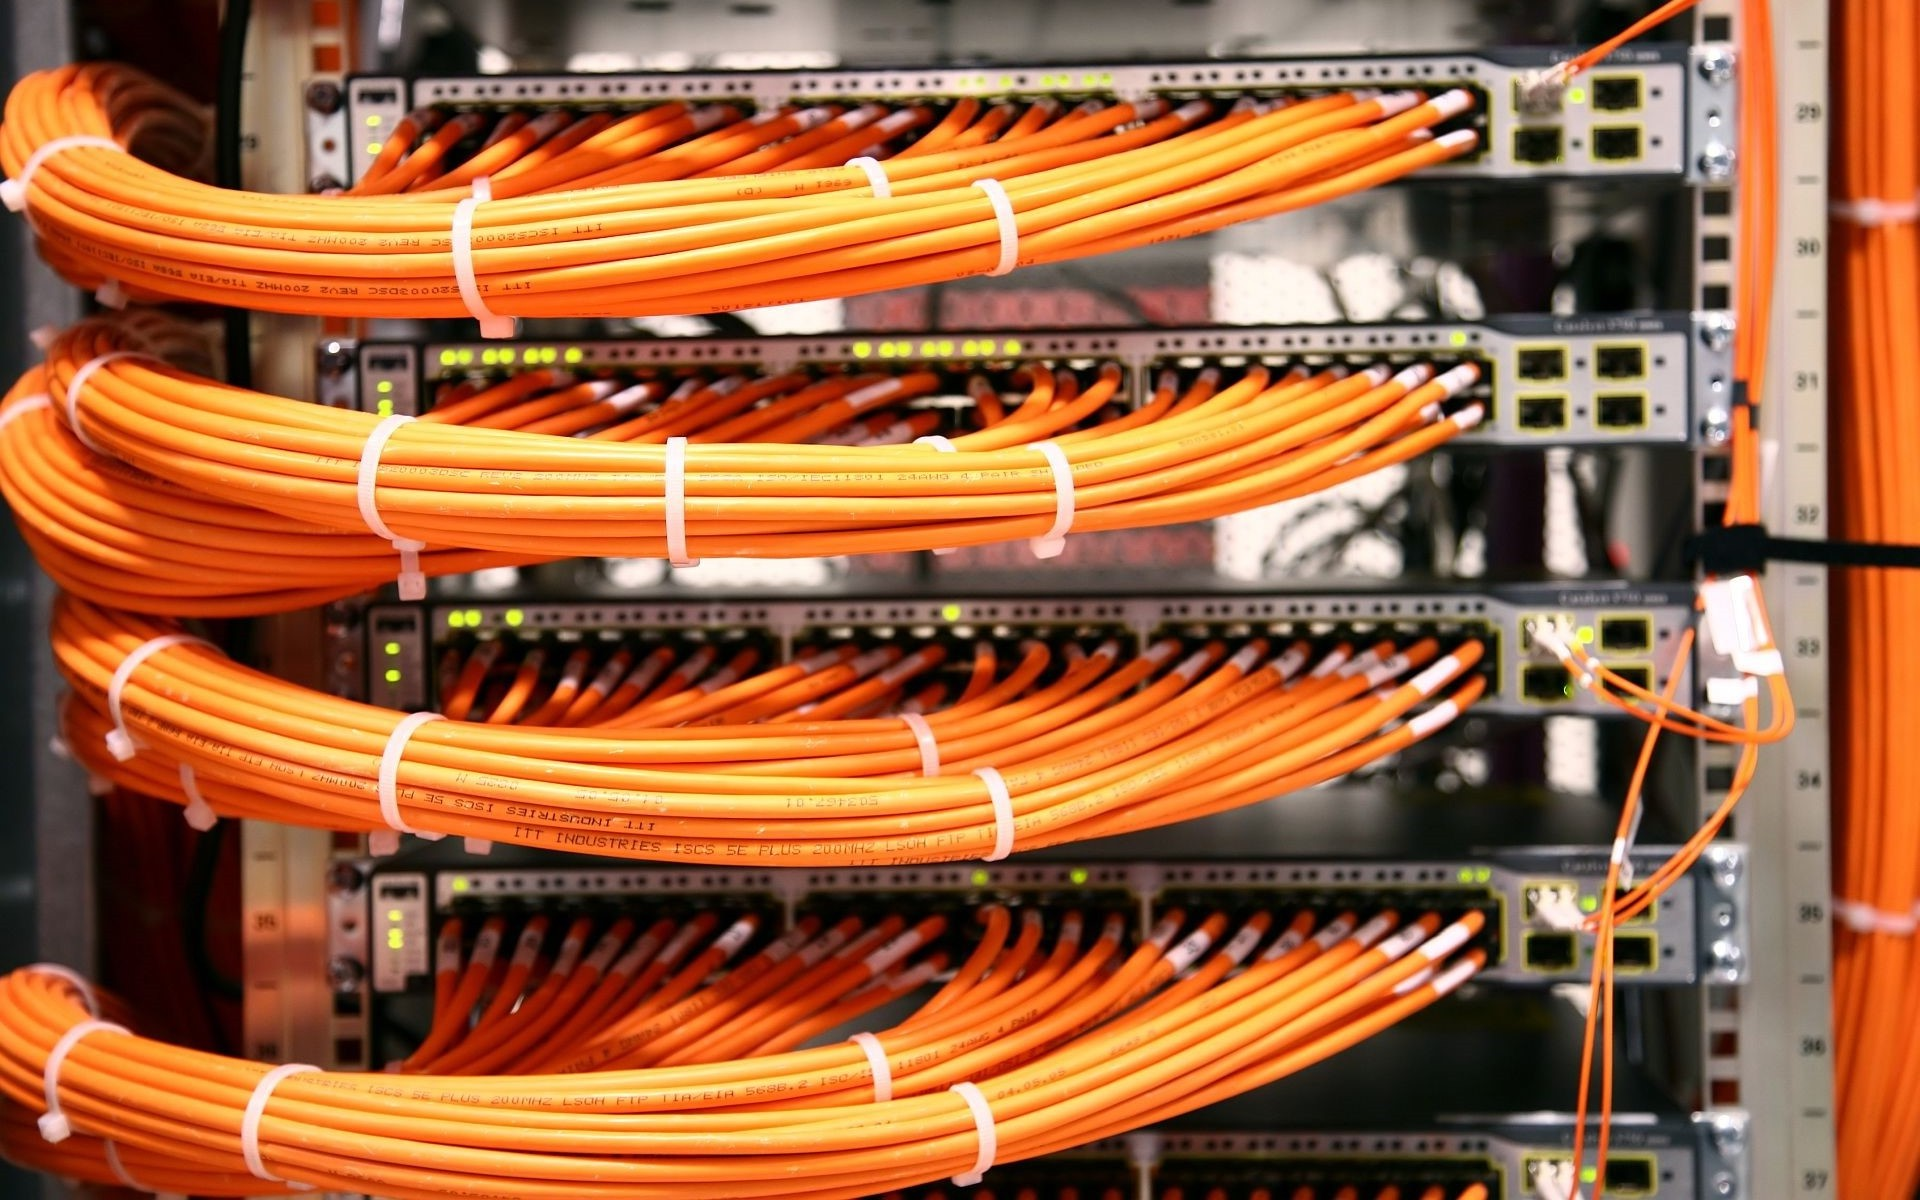 7036117-server-ethernet-cables